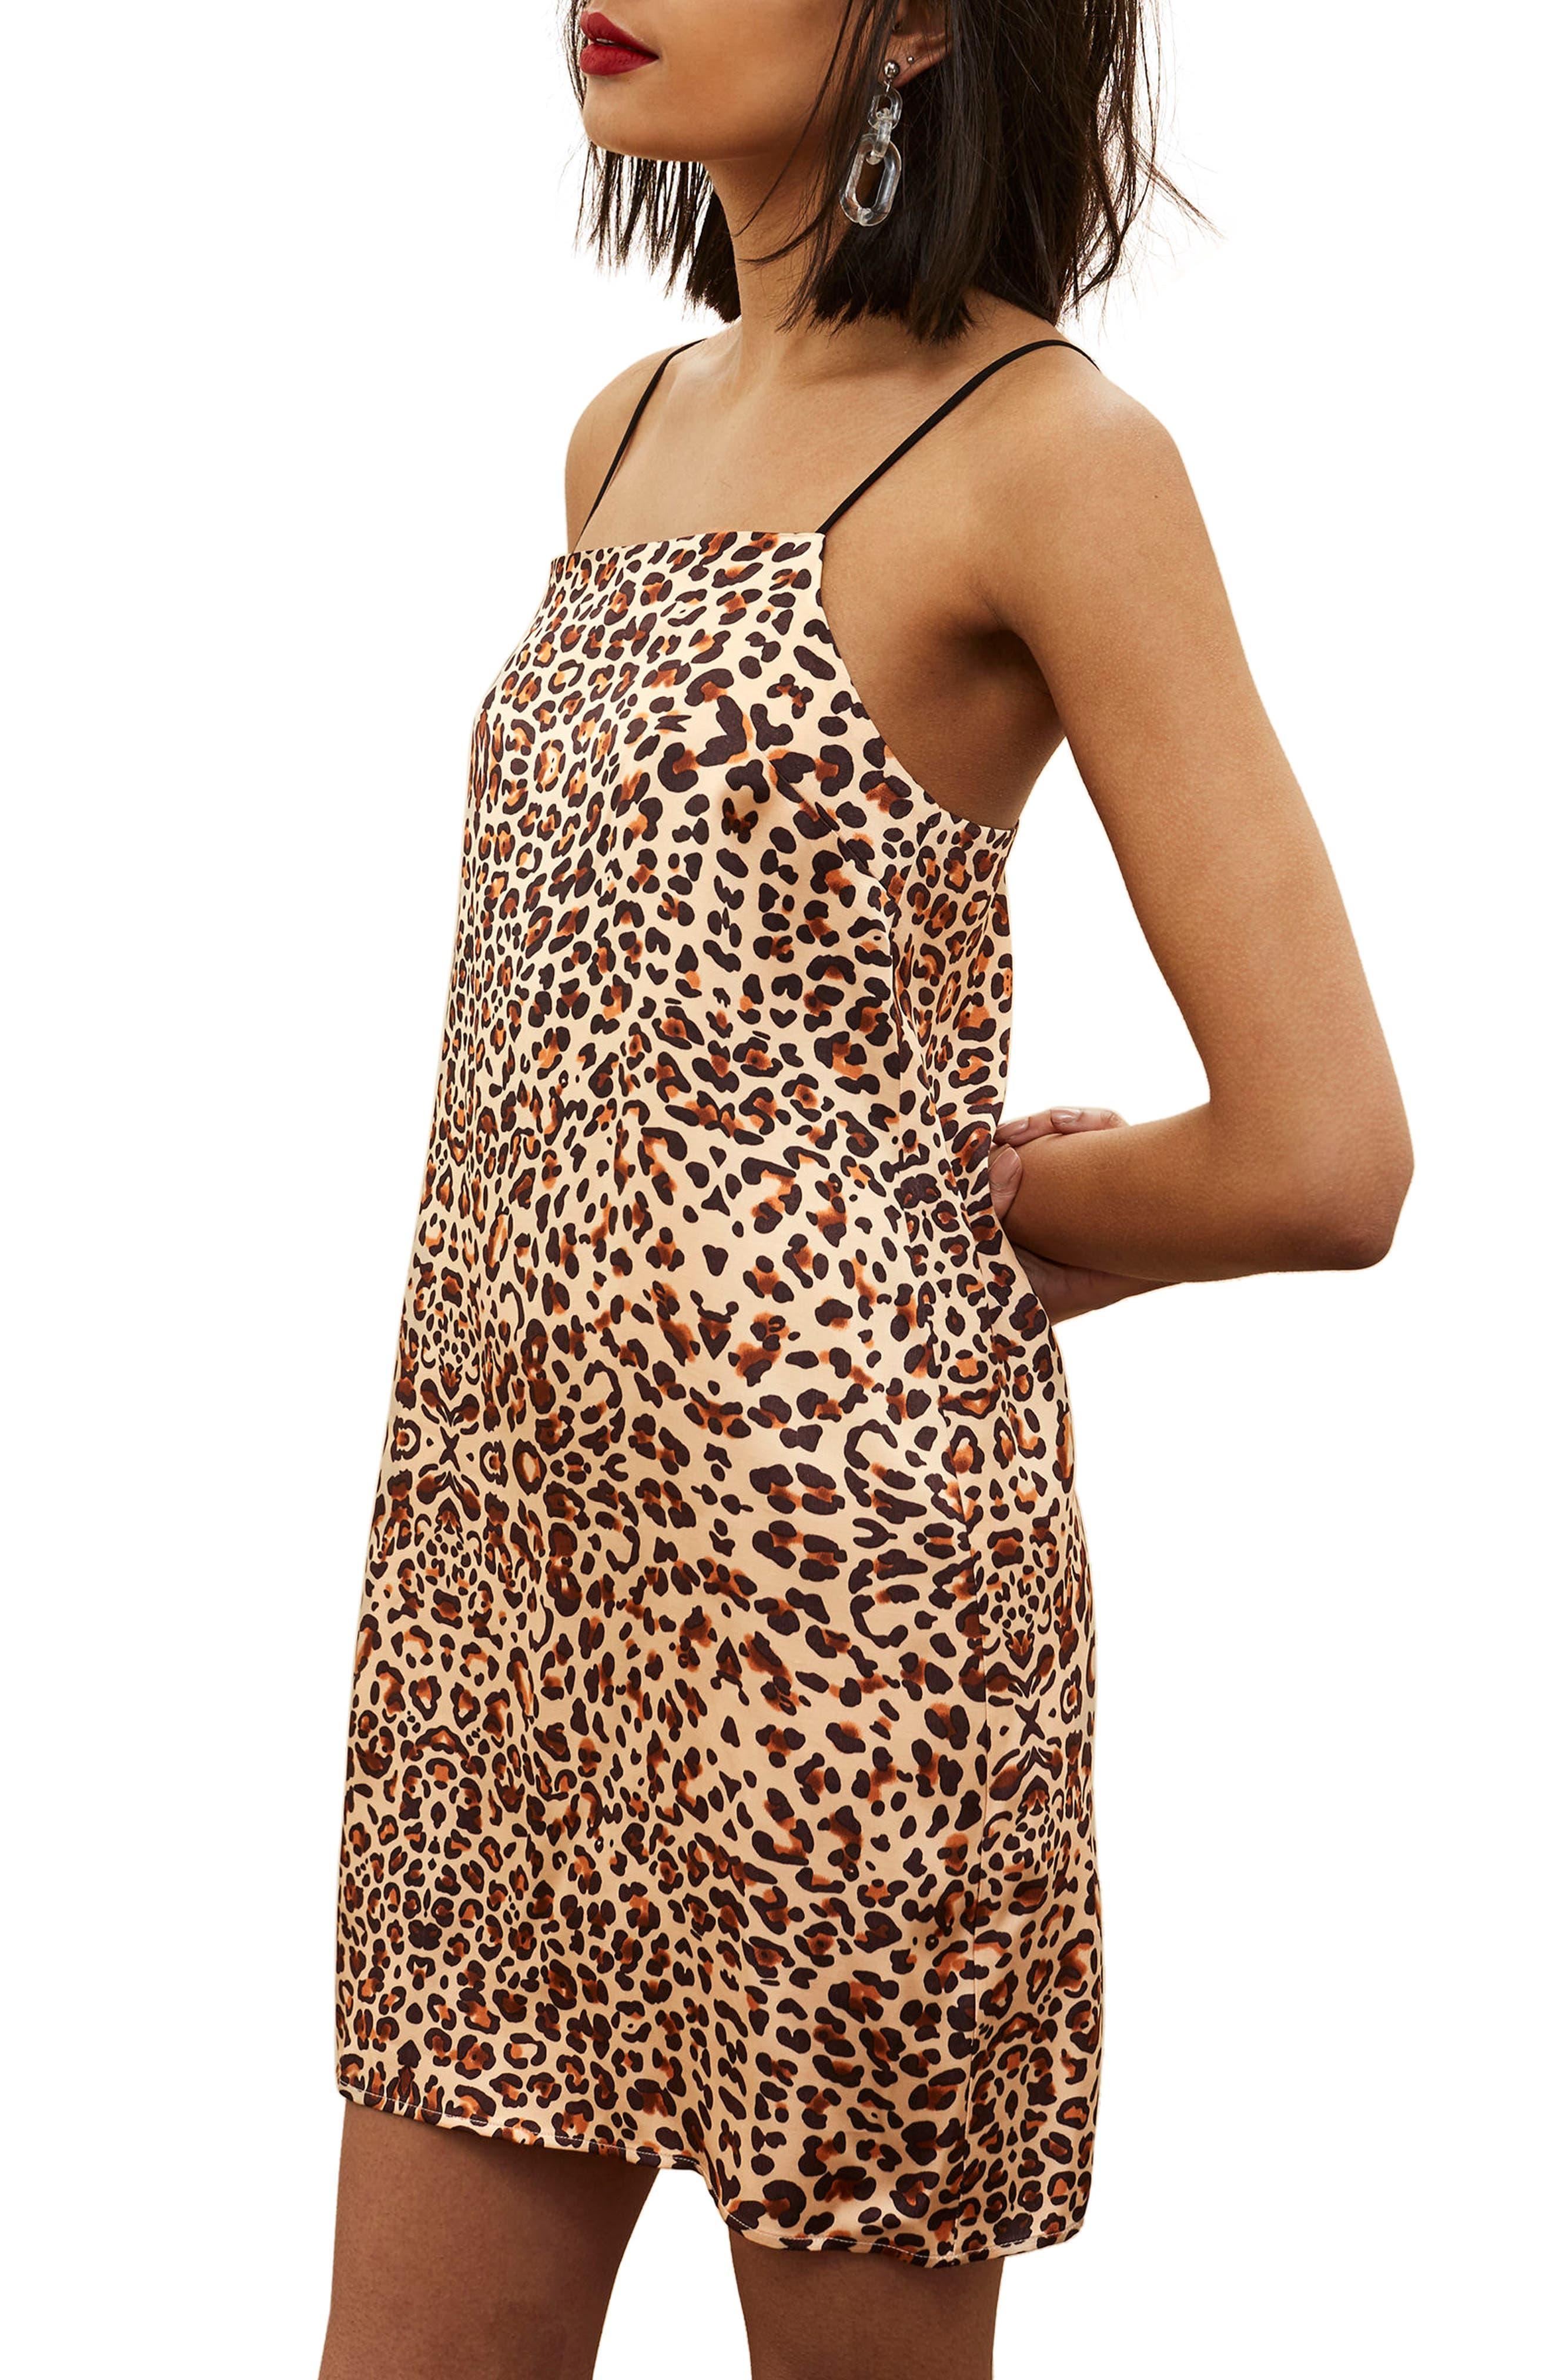 Alternate Image 1 Selected - Topshop Leopard Mini Slipdress